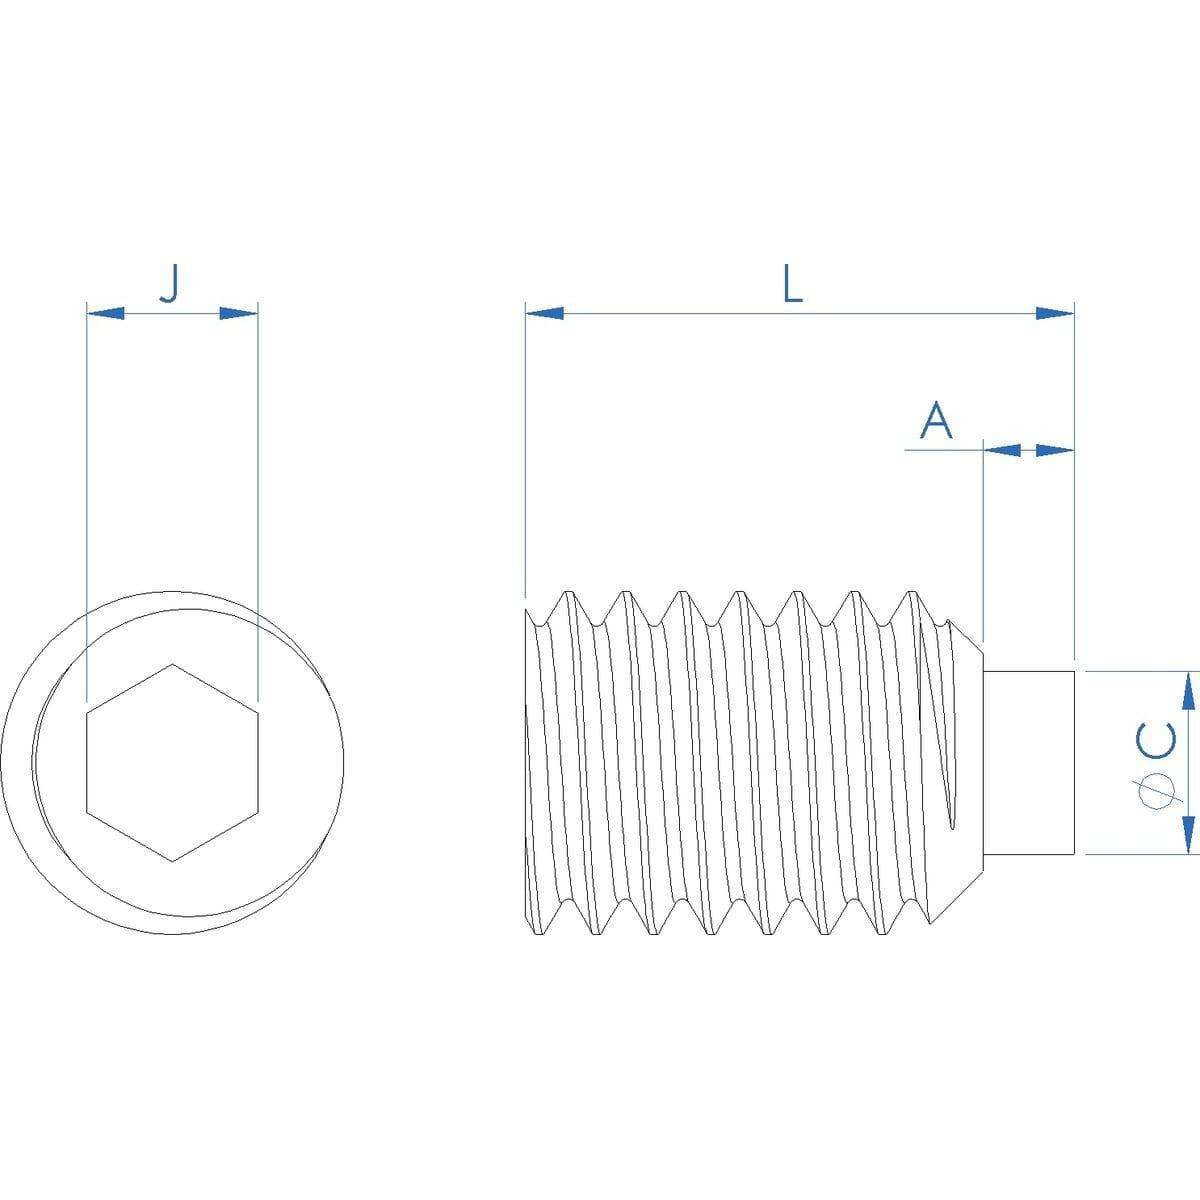 M3 x 4mm Nylon Tip Set Screws / Grub Screws - Stainless Steel / Nylon Insert Drawing